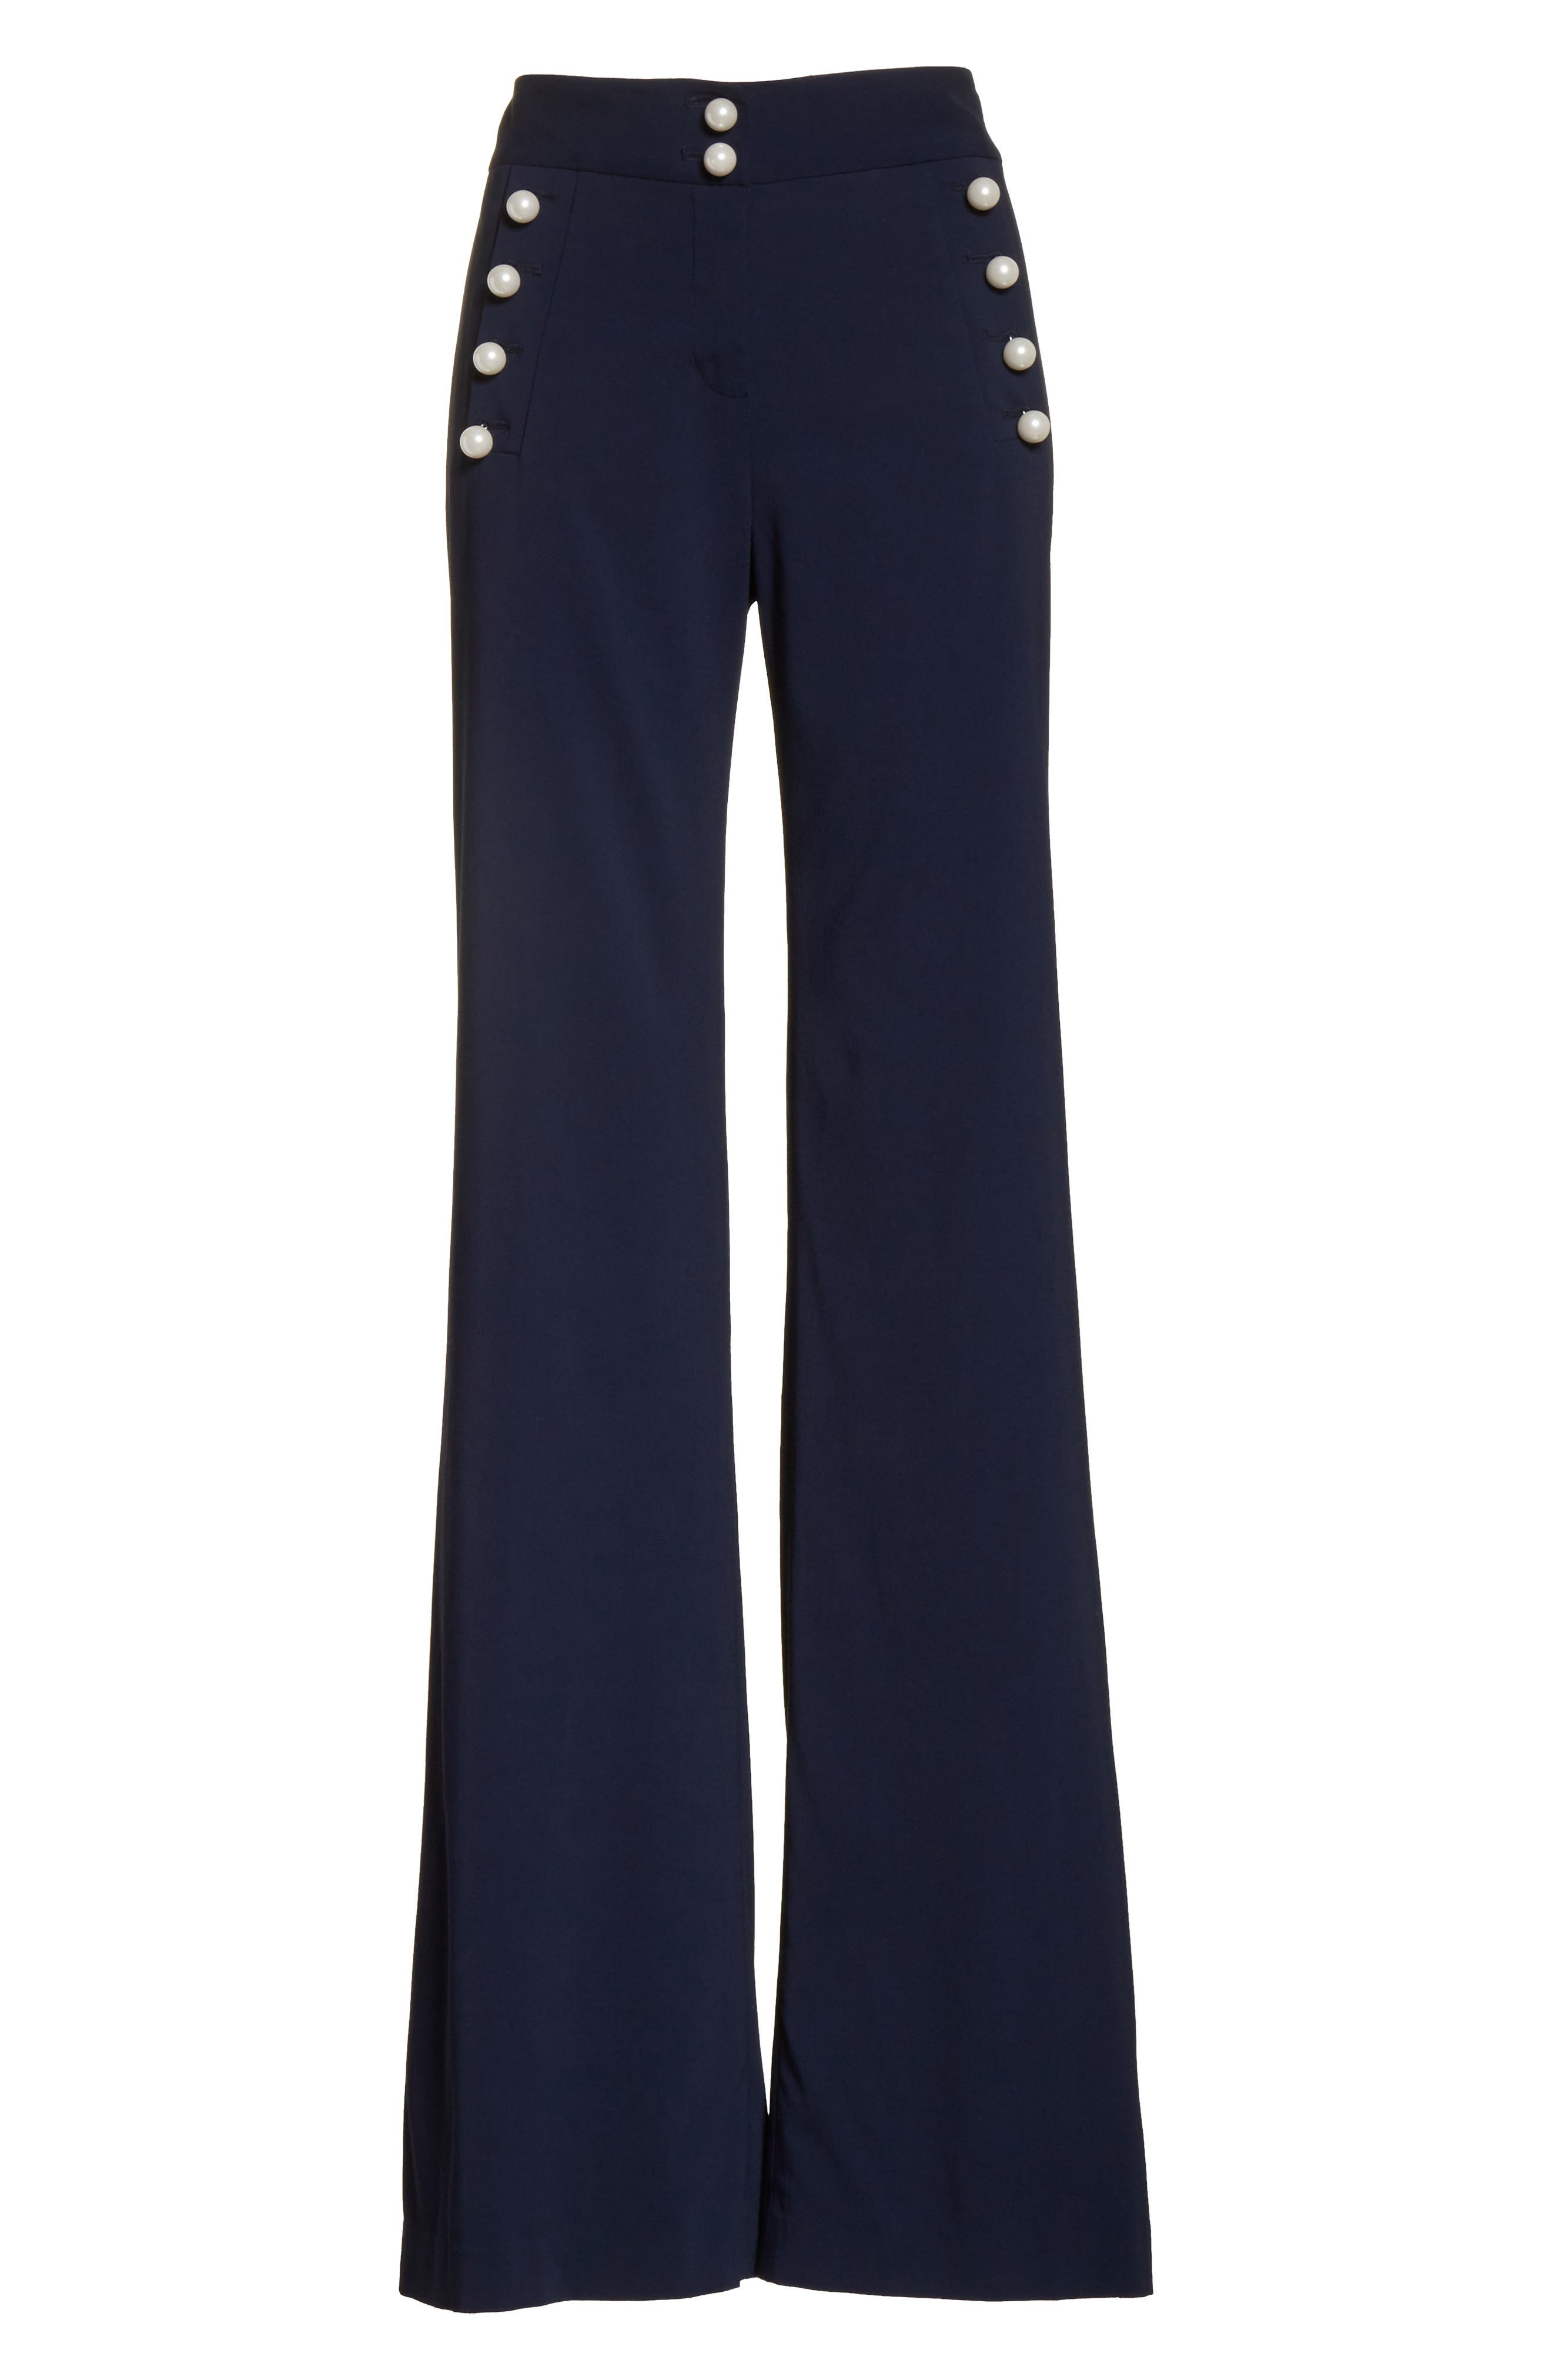 Adley Sailor Pants,                             Alternate thumbnail 7, color,                             Navy